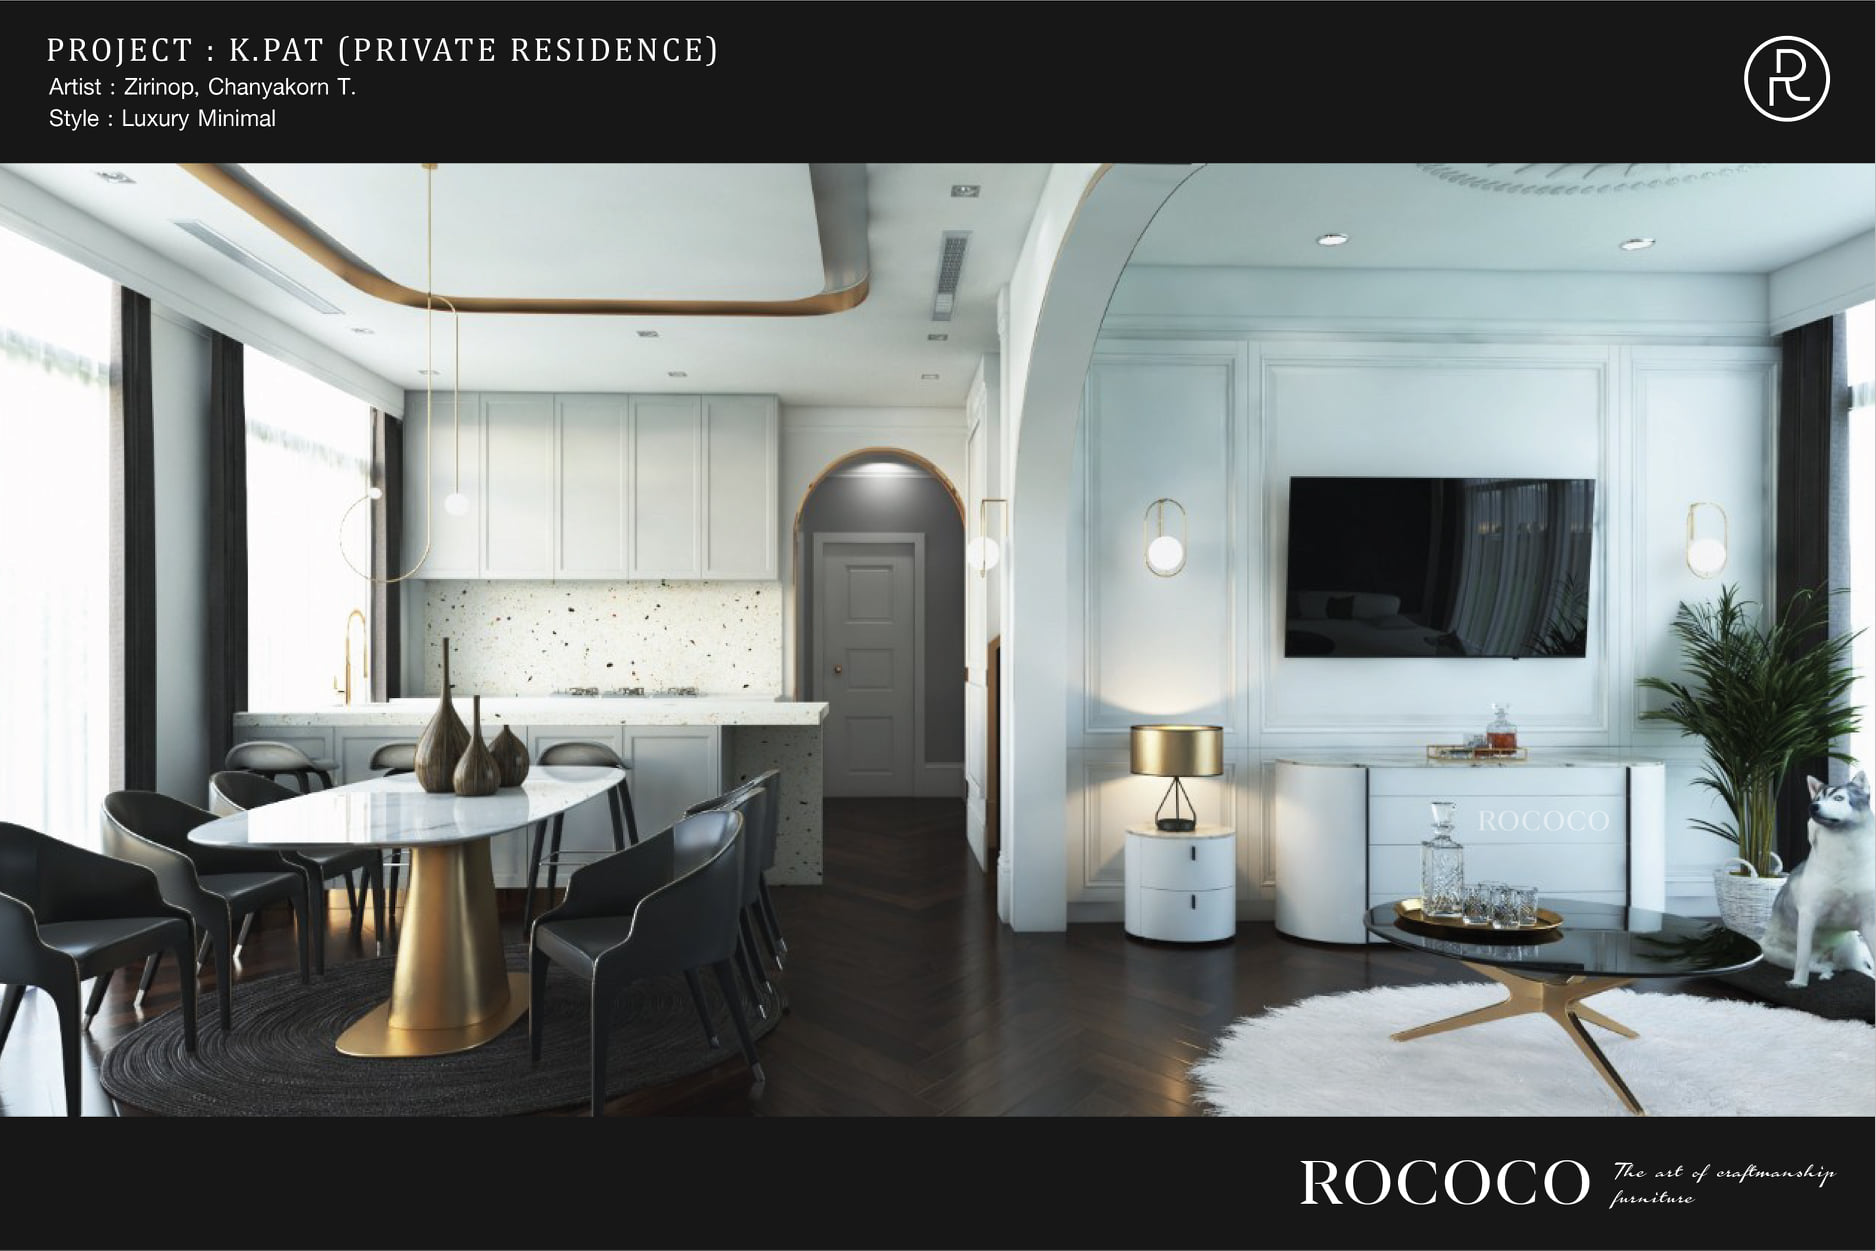 K. PAT Private Residence